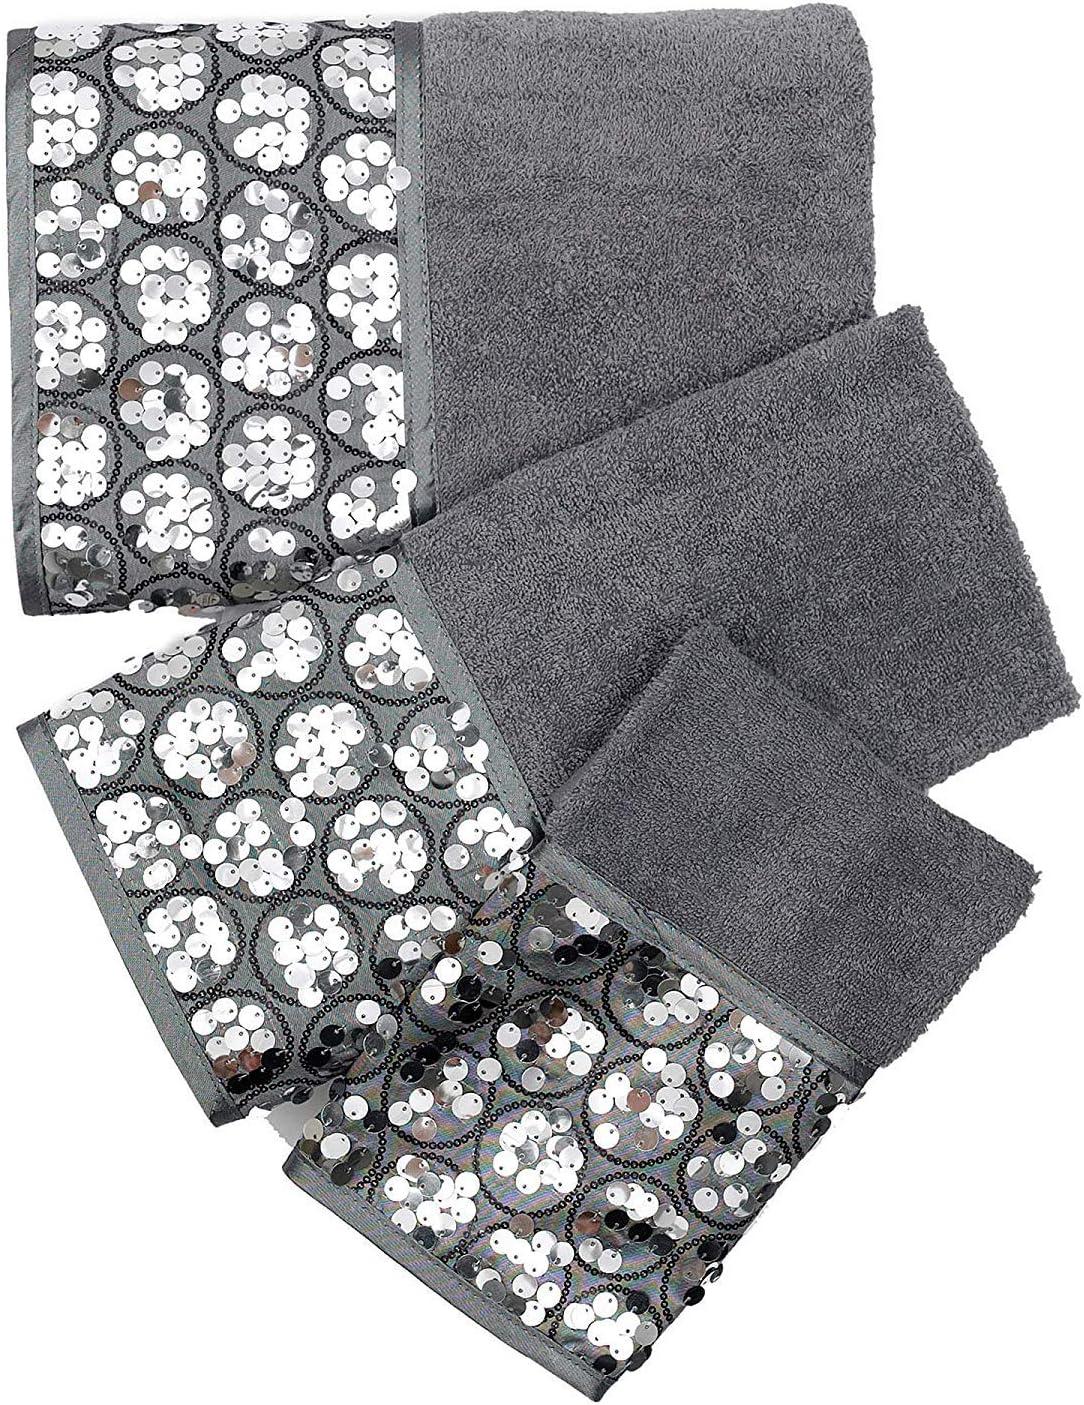 "Popular Bath /""Sinatra Silver/"" 3-Piece Towel Set New Free Shipping"